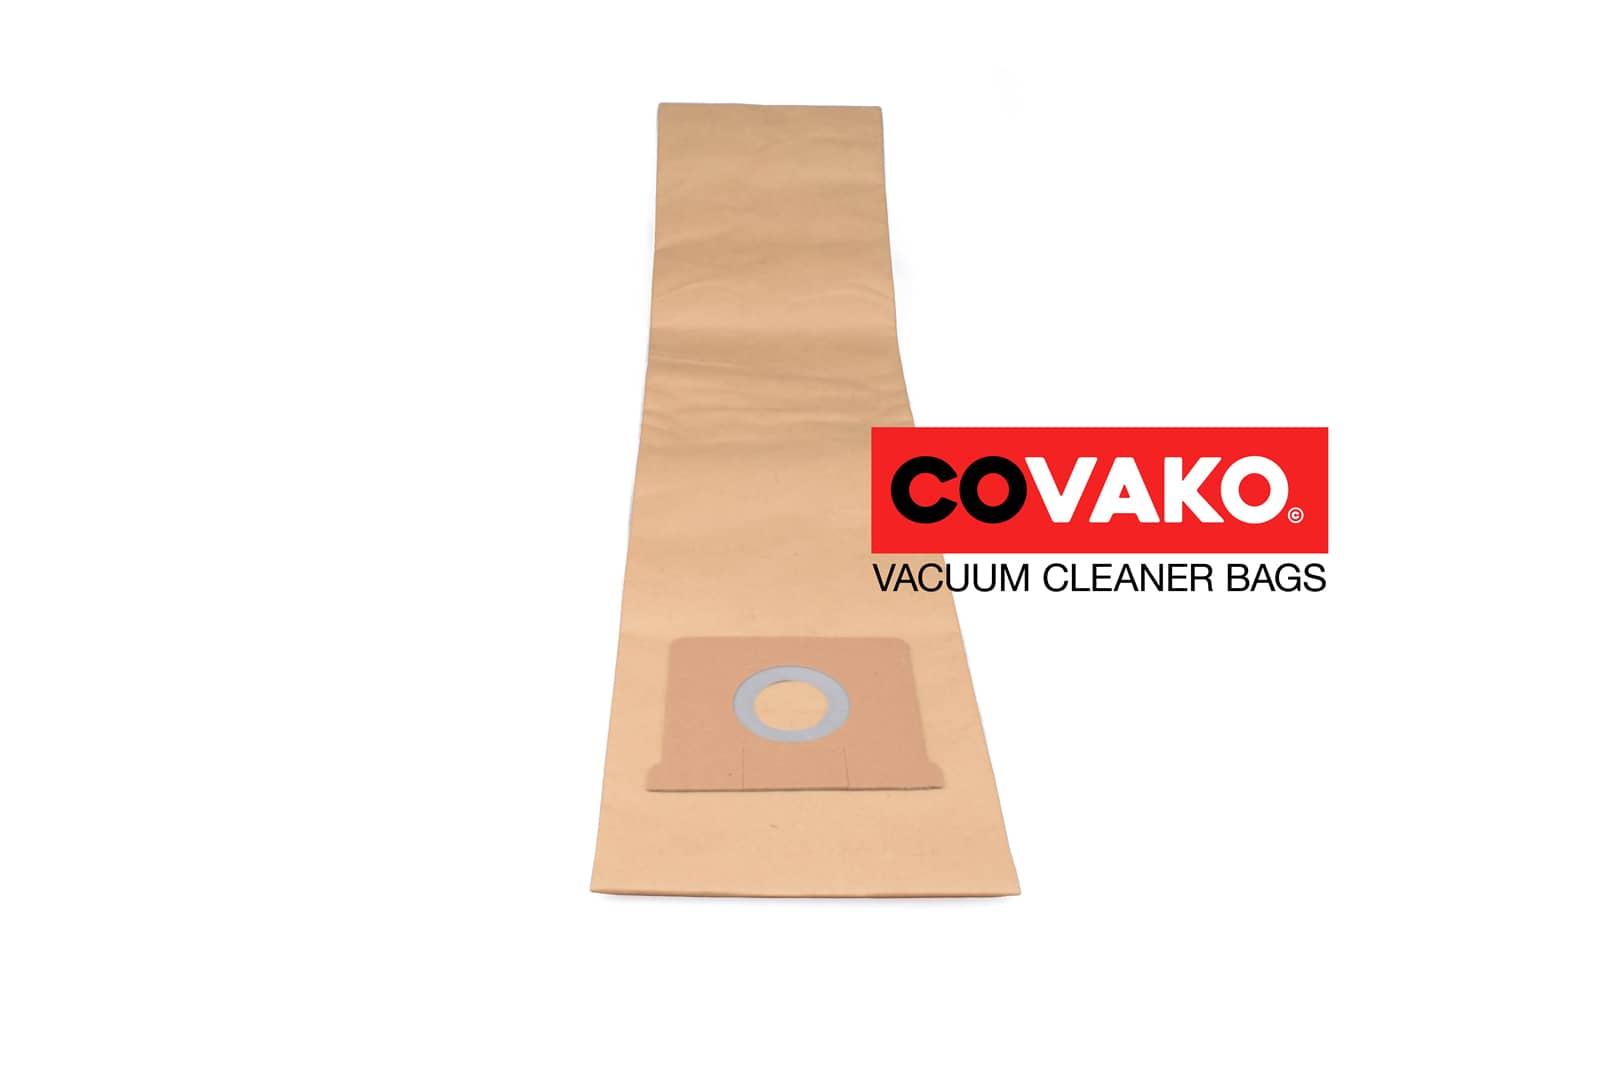 Kärcher NT 40/1 Tact / Paper - Kärcher vacuum cleaner bags